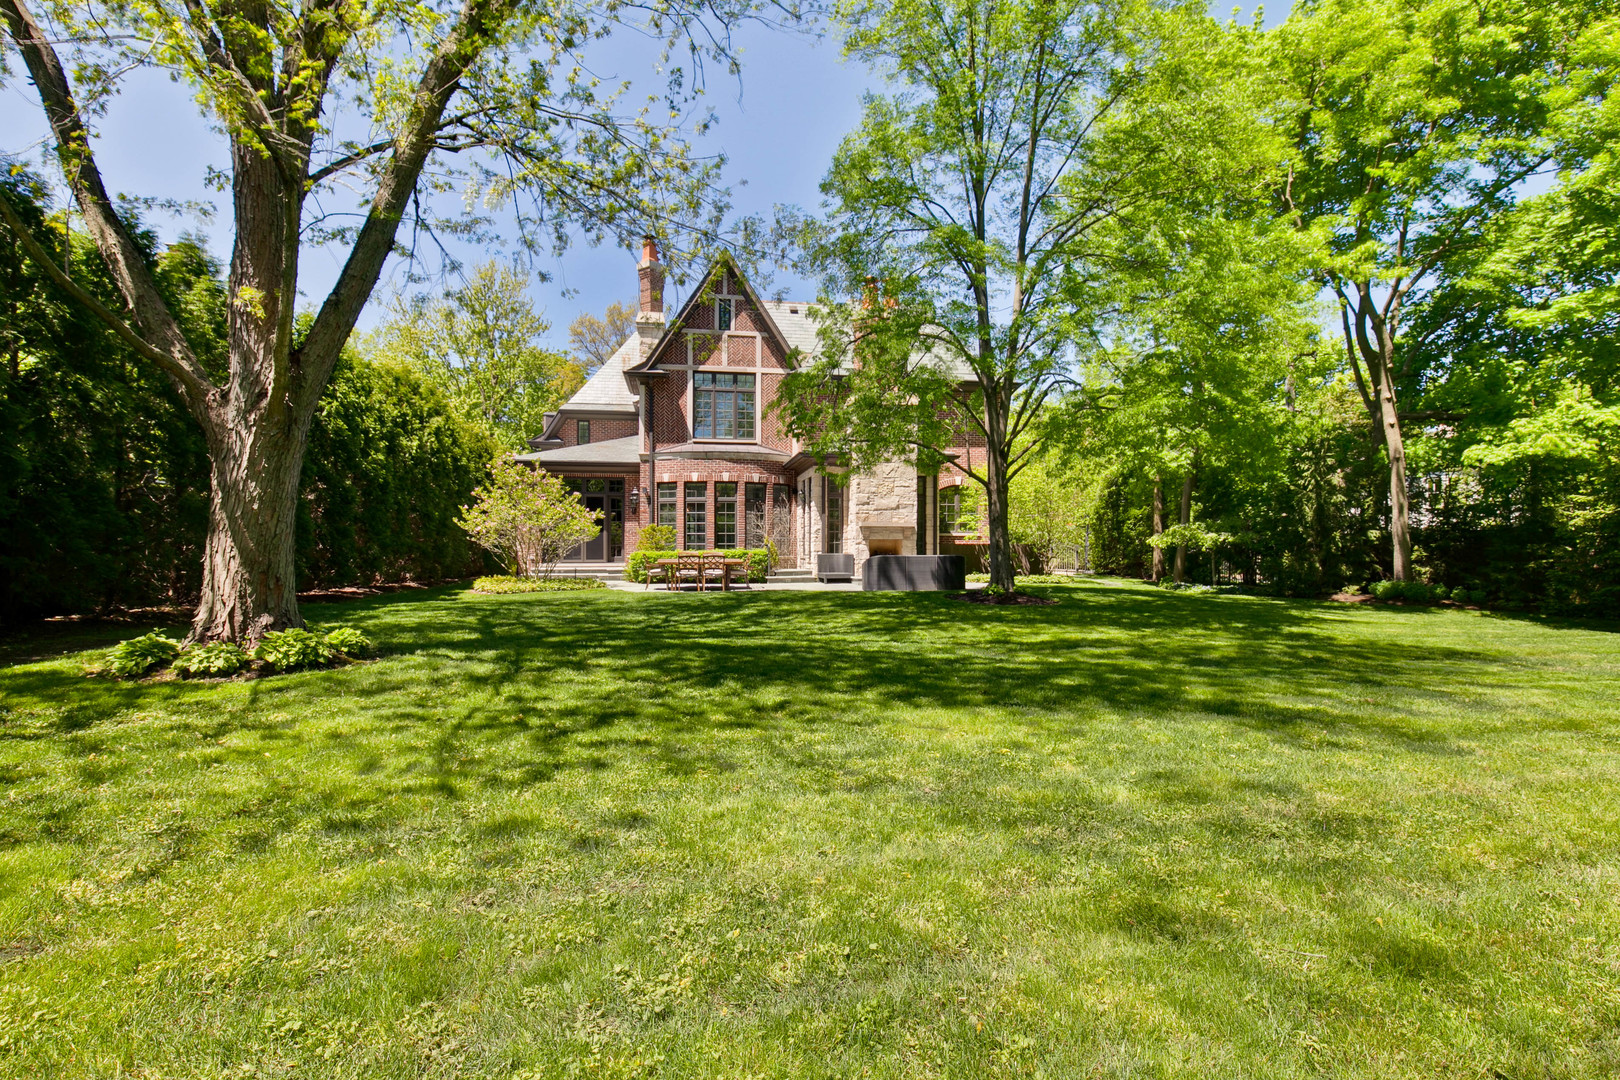 815 Greenleaf, Glencoe, Illinois, 60022